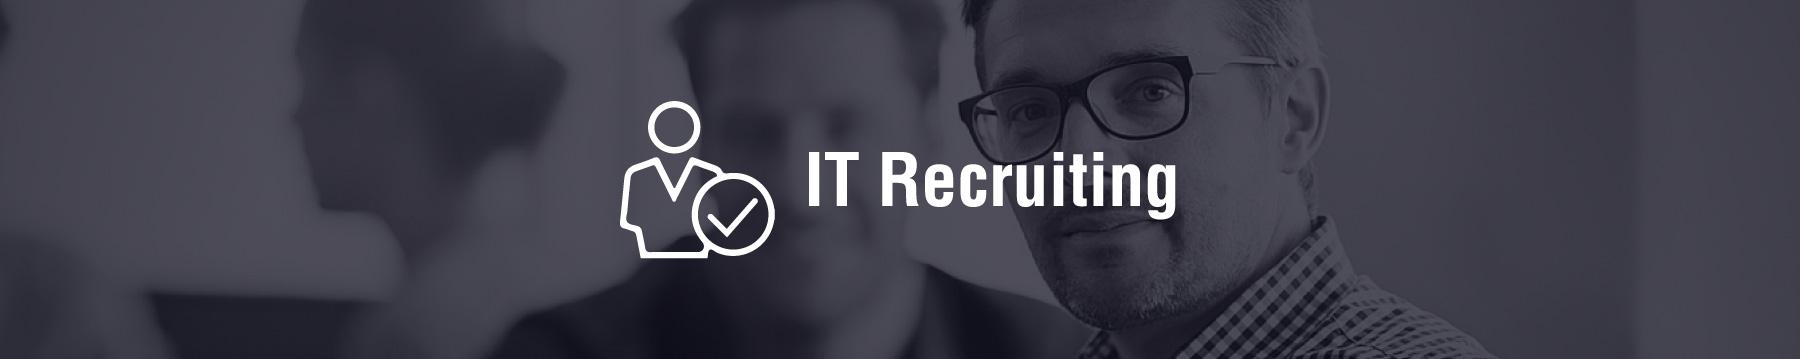 Digital Marketing | IT Recruiting | Staffing Agency | Minneapolis - Omtech